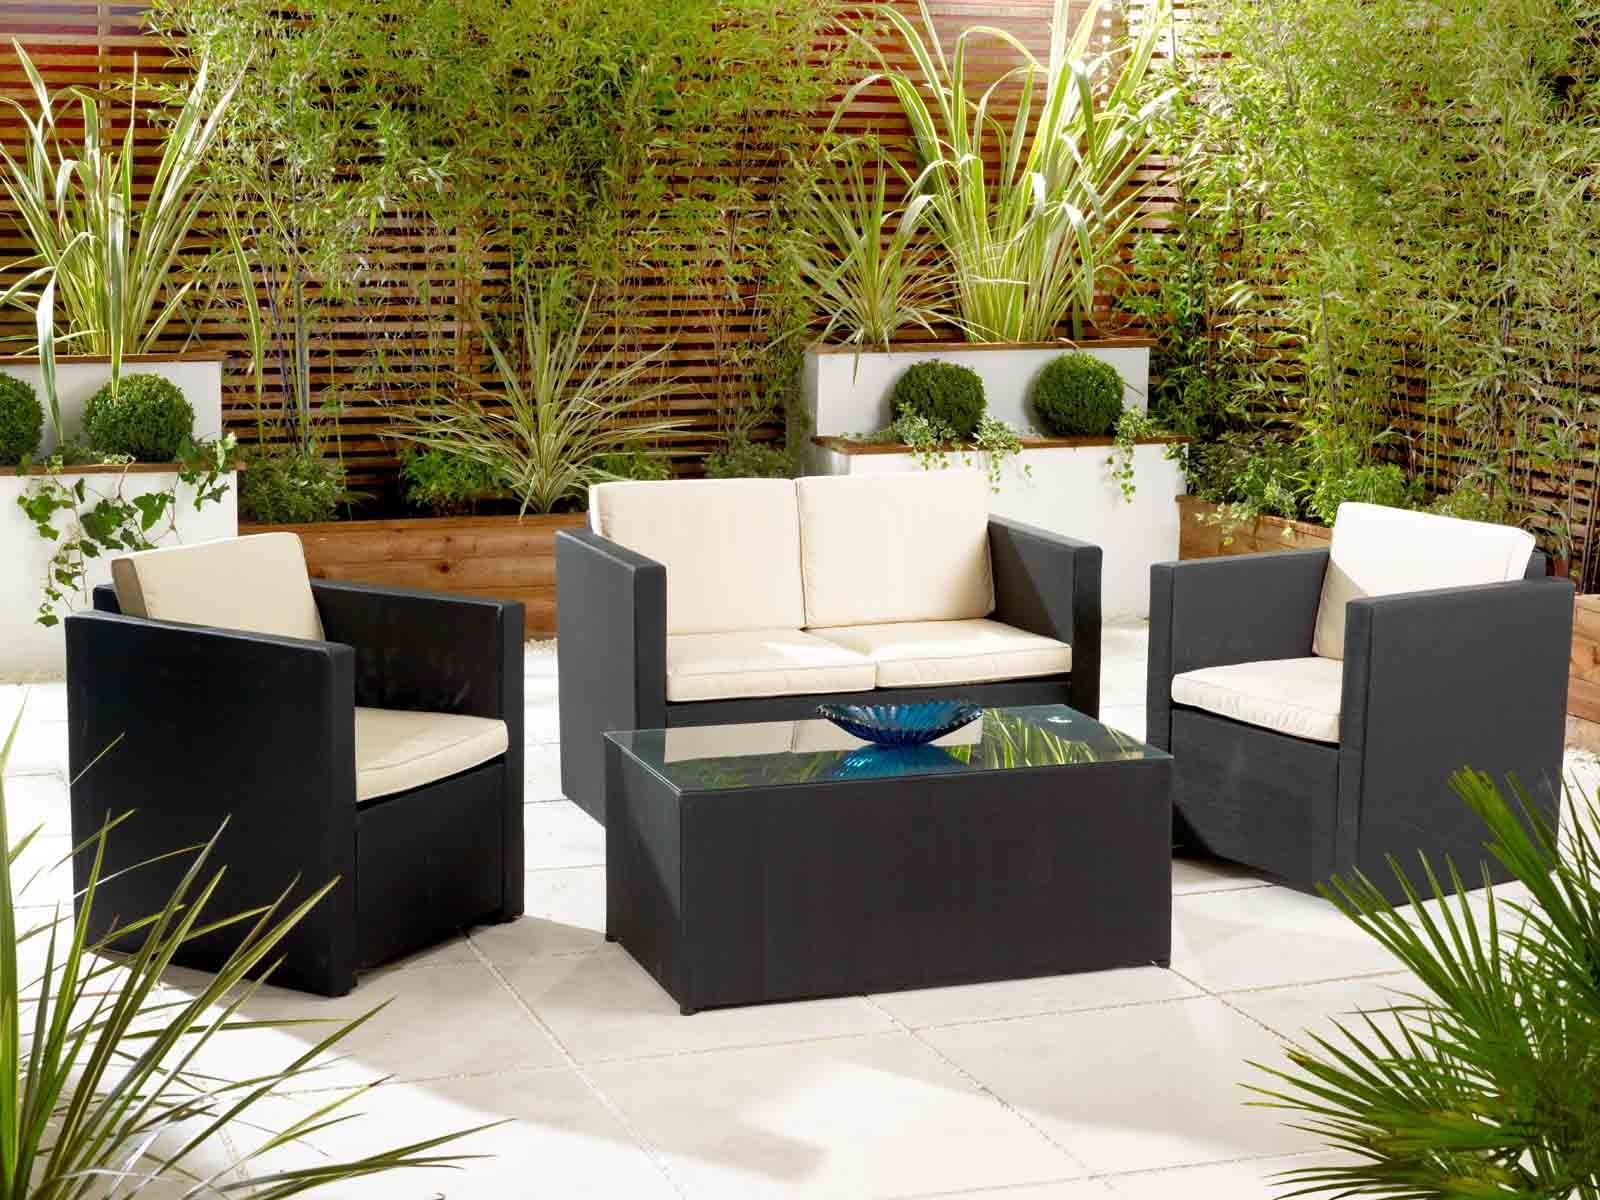 25 Stunning Garden Furniture Inspiration – The WoW Style